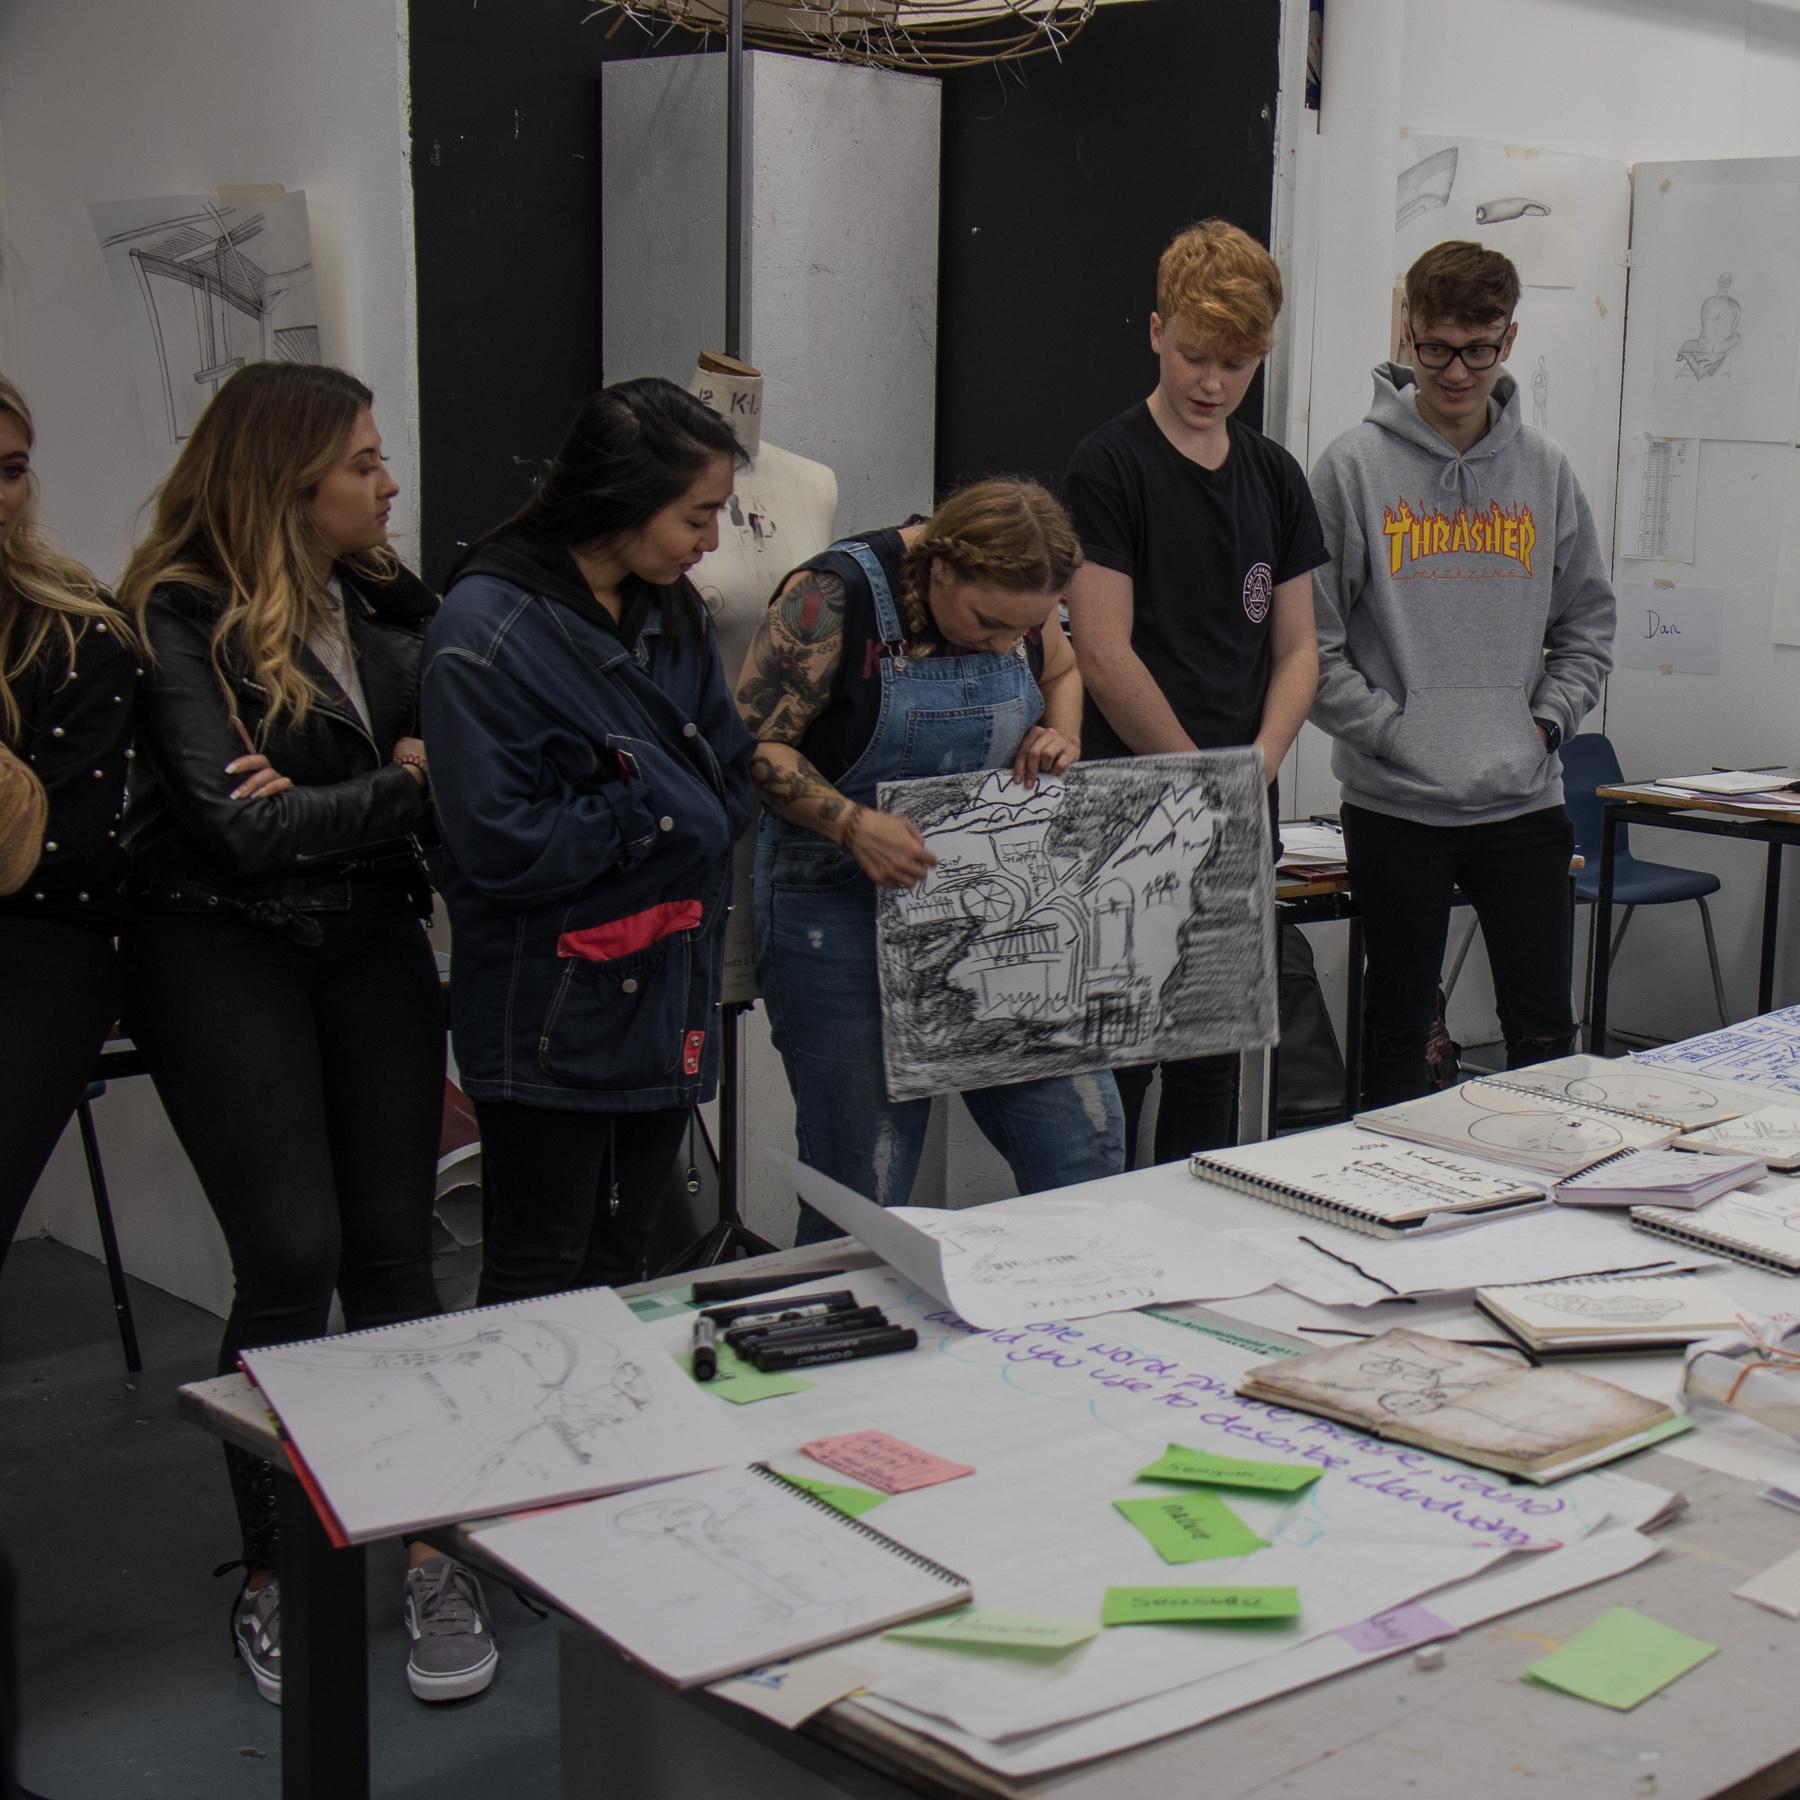 coleg llandrillo workshop (3 of 29).jpg